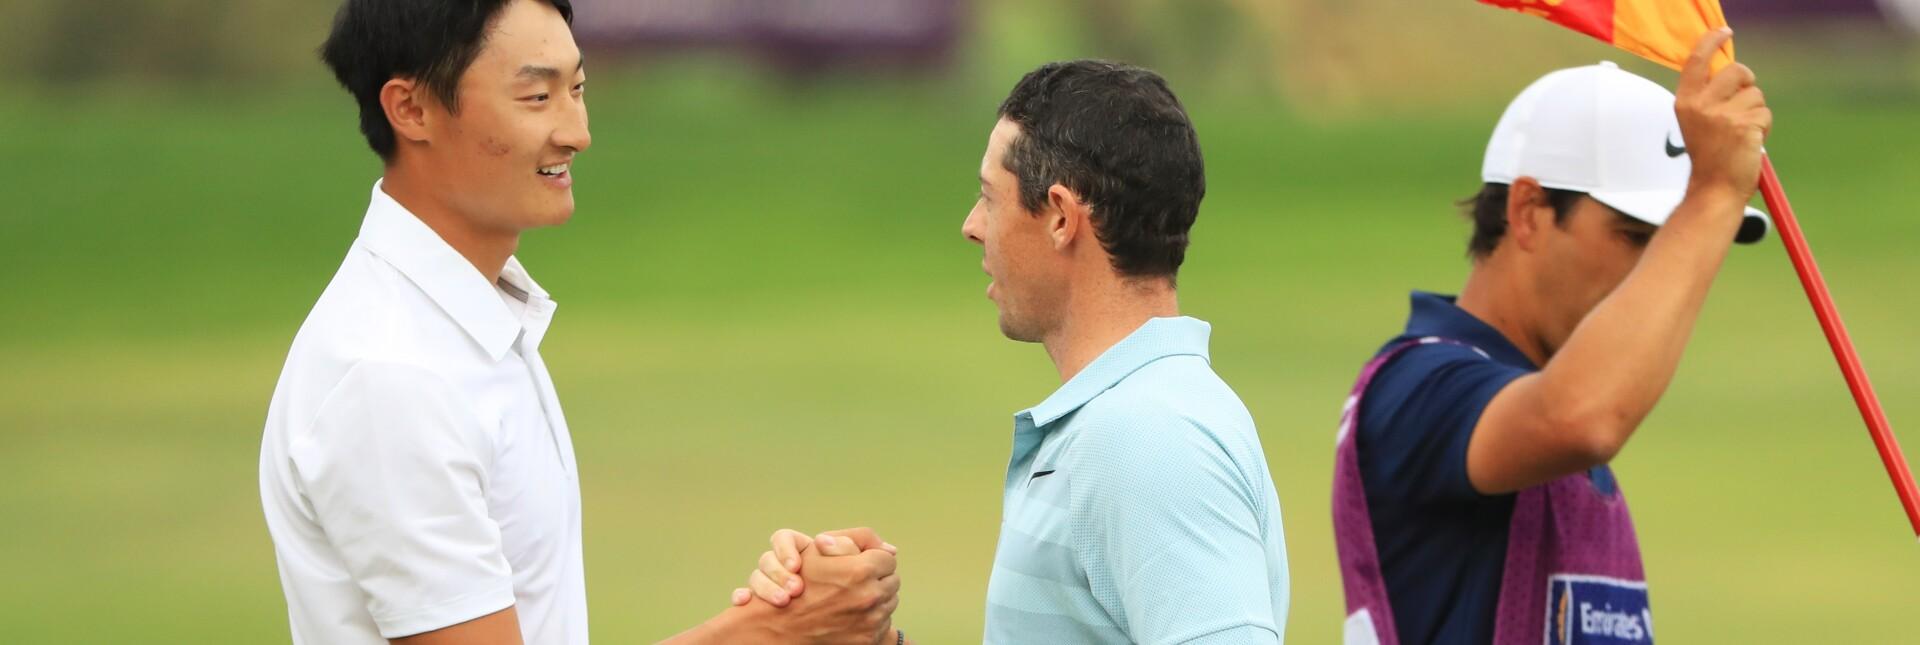 Rory and Haotong.jpg